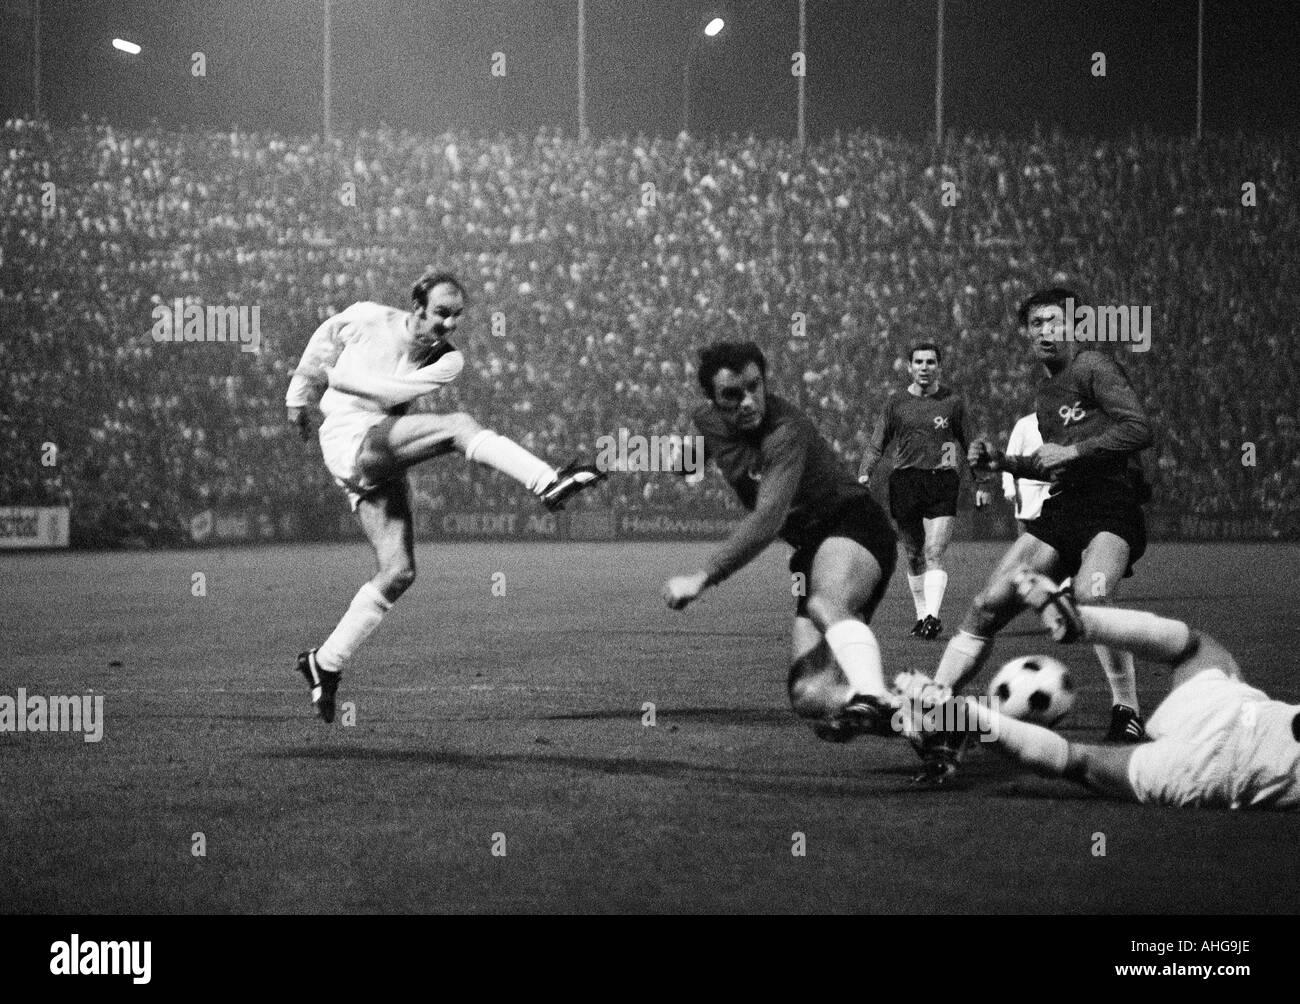 football, Bundesliga, 1970/1971, Borussia Moenchengladbach versus Hanover 96 0:0, Boekelberg Stadium, scene of the match, f.l.t.r. Horst Koeppel (MG) shots on goal, Klaus Bohnsack, Claus Brune, Hans Josef Hellingrath (all 96) - Stock Image